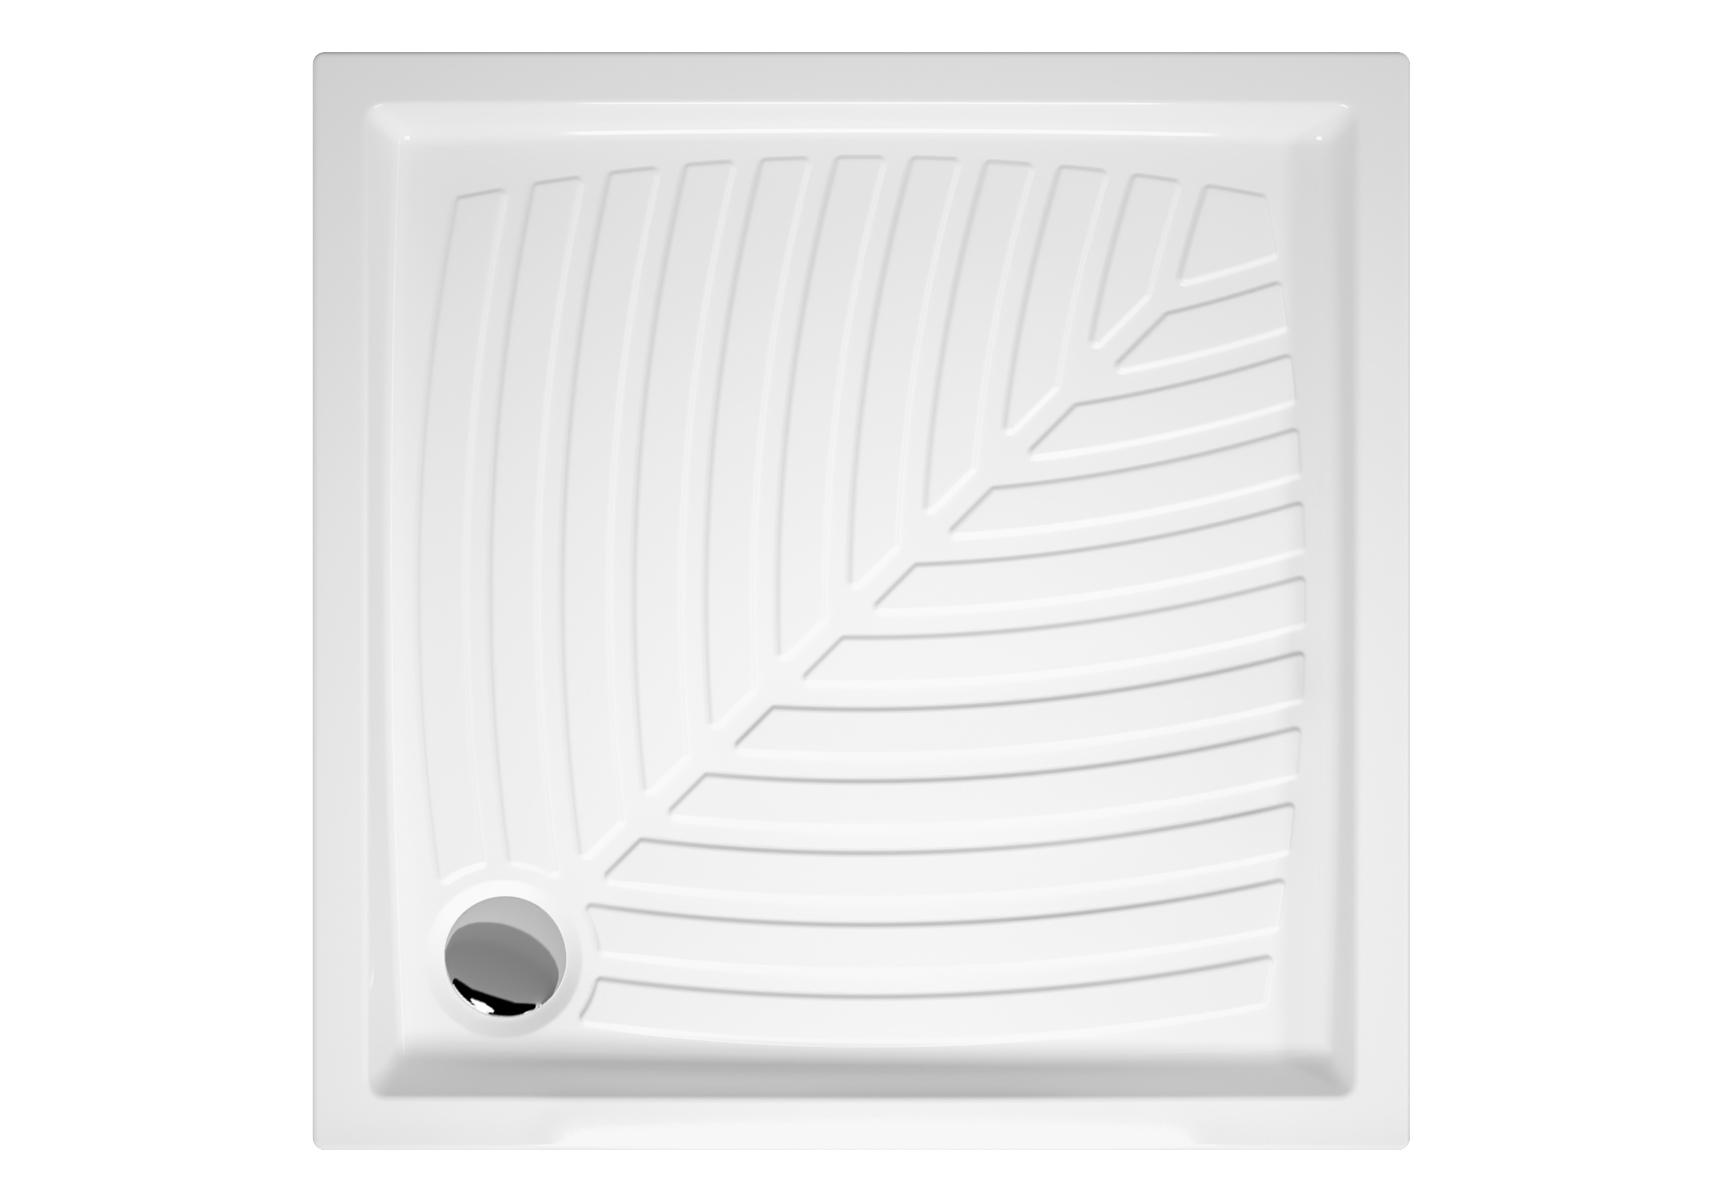 Arkitekt receveur à encastrer ou à poser fond extra plat, 80  x  80 cm, blanc